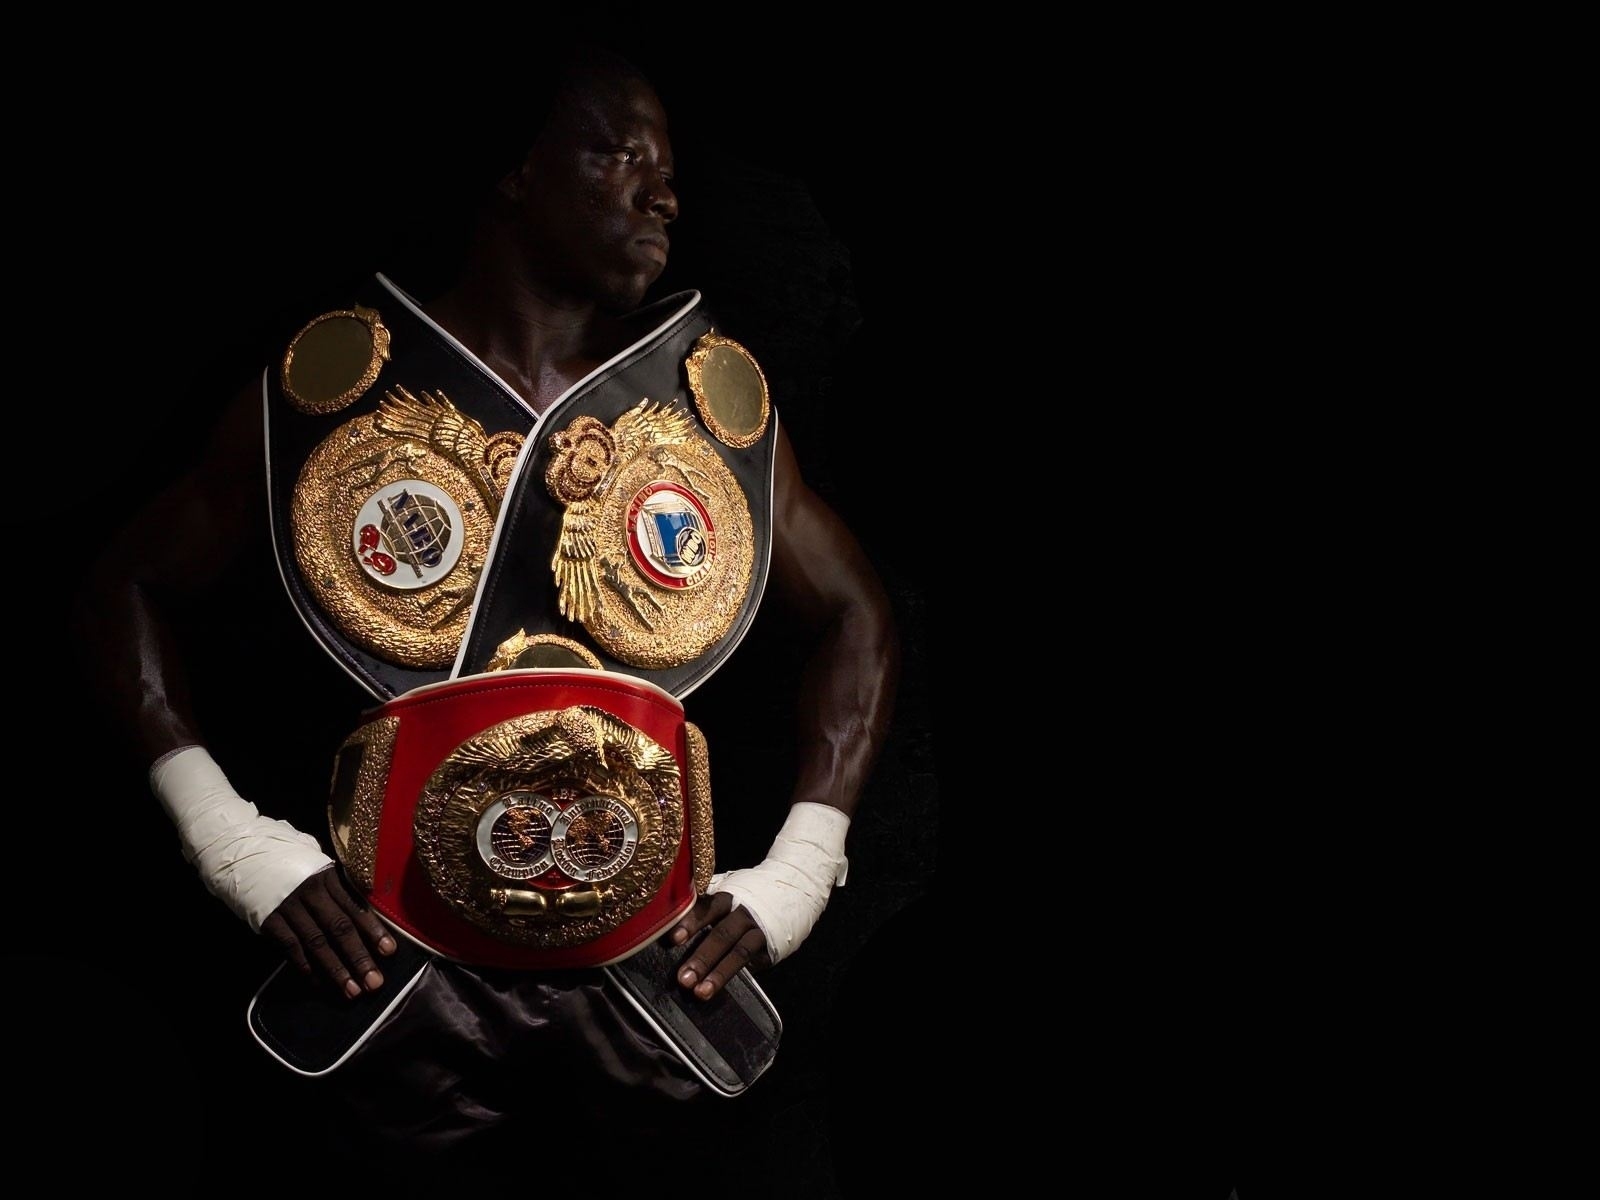 Спорт бокс чемпион пояса бинты обои